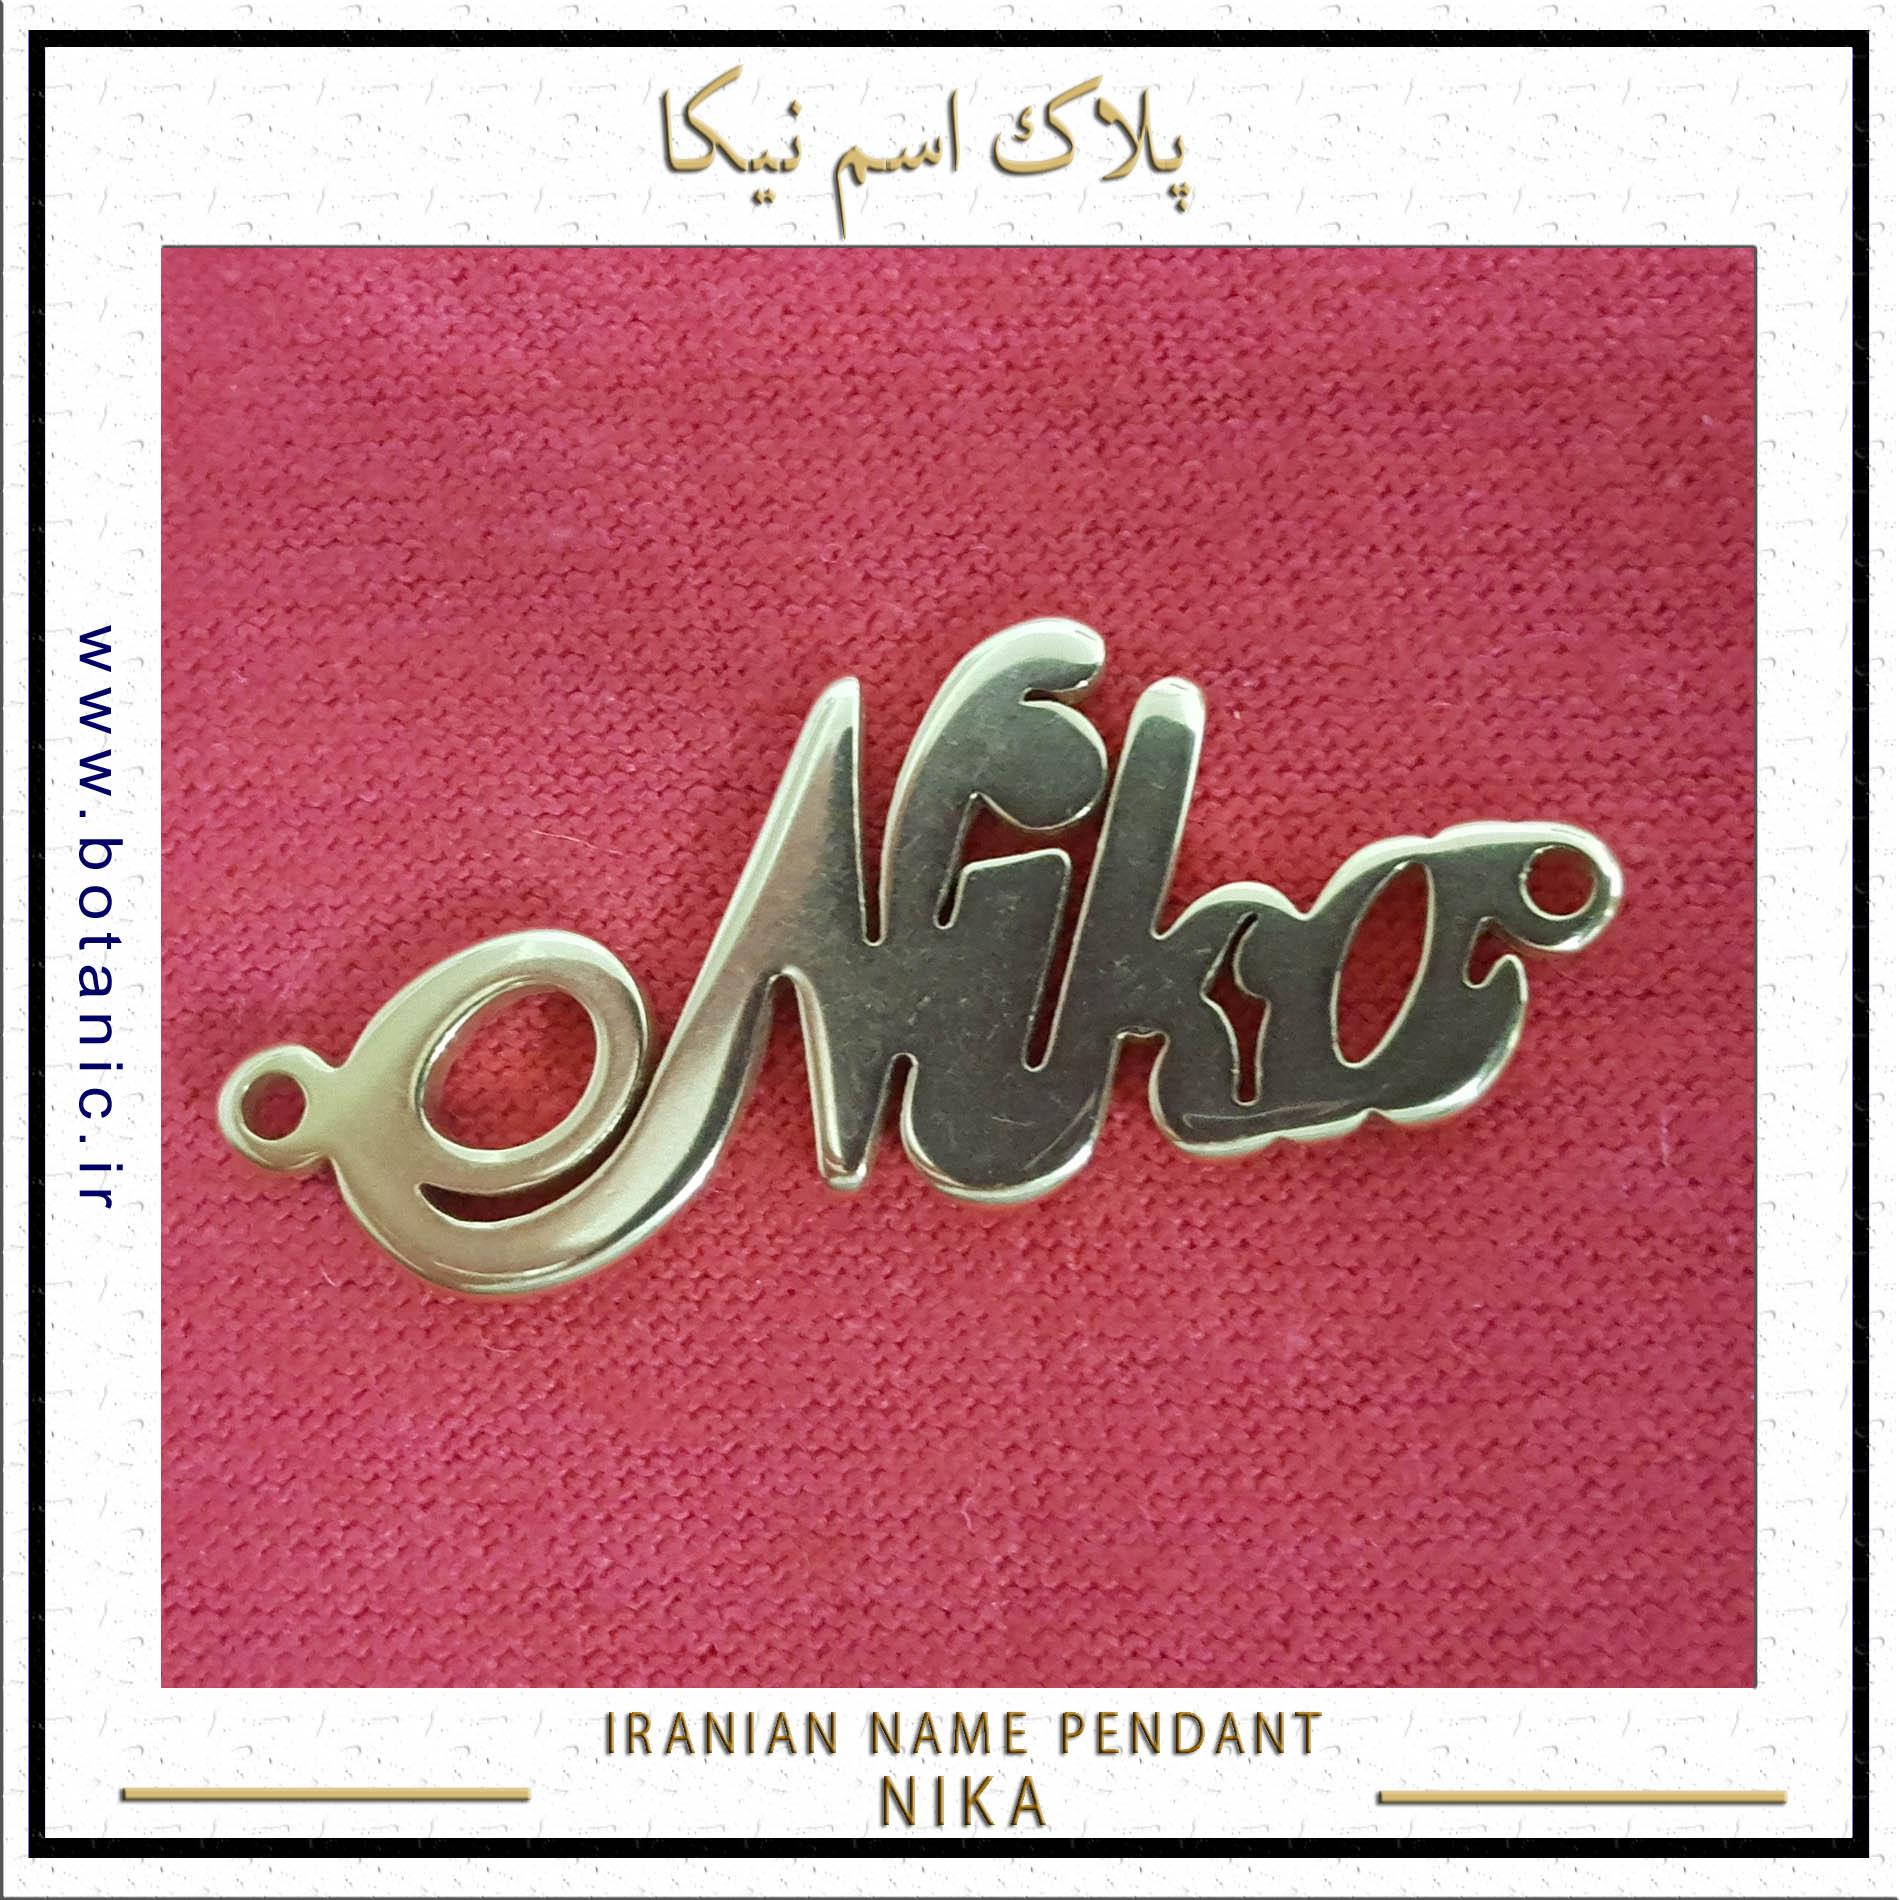 Iranian Name Pendant Nika